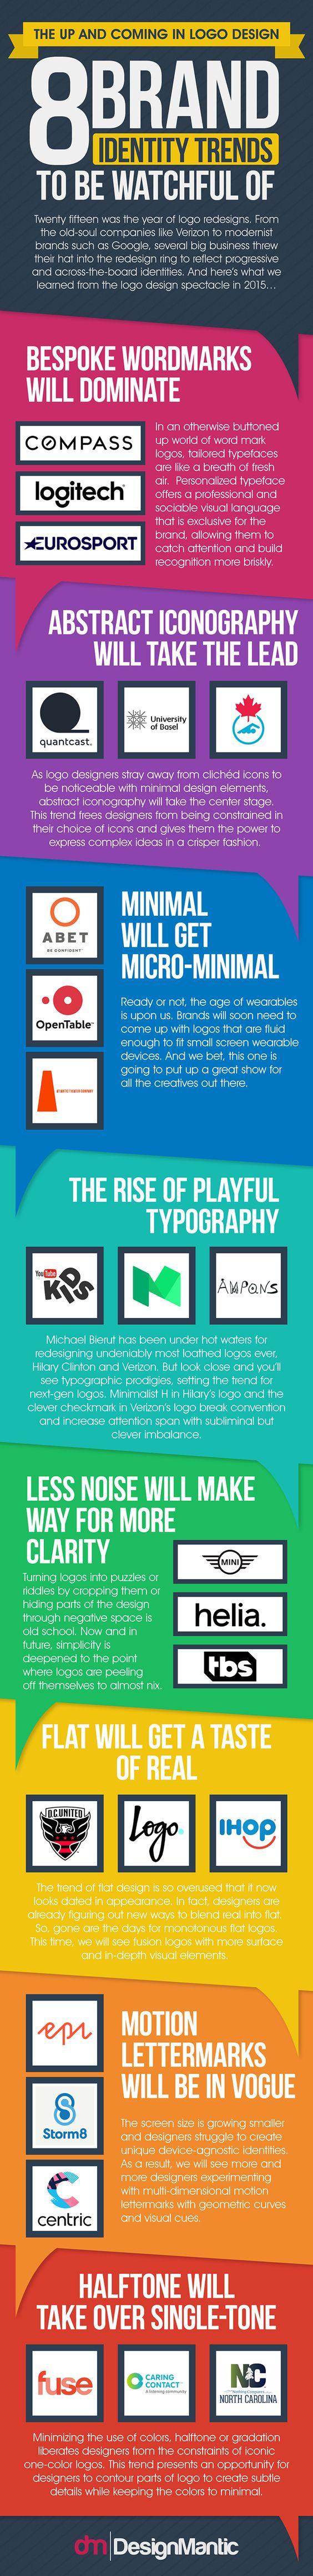 https://creativemarket.com/blog/eight-brand-identity-trends-for-2016/